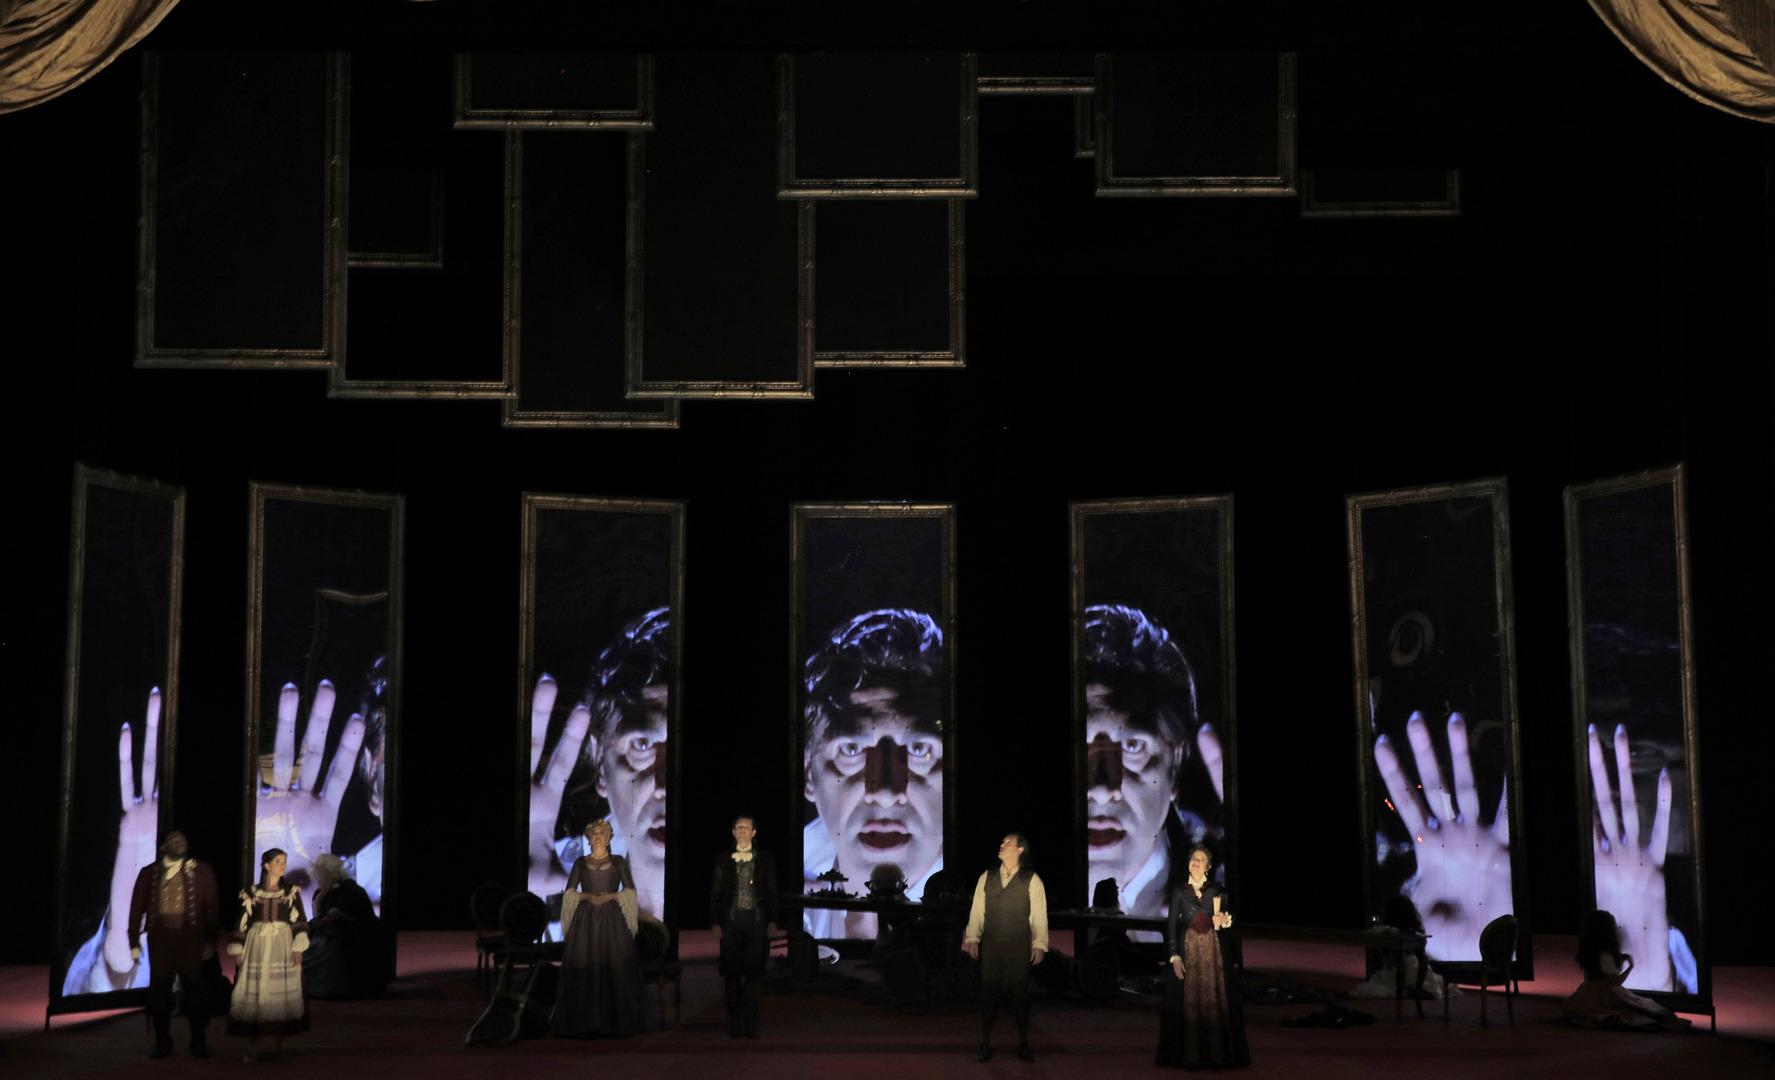 Opera-Director-Jacopo-Spirei-Don-Giovanni-Opera-by-Mozart-San-Francisco-2017-13